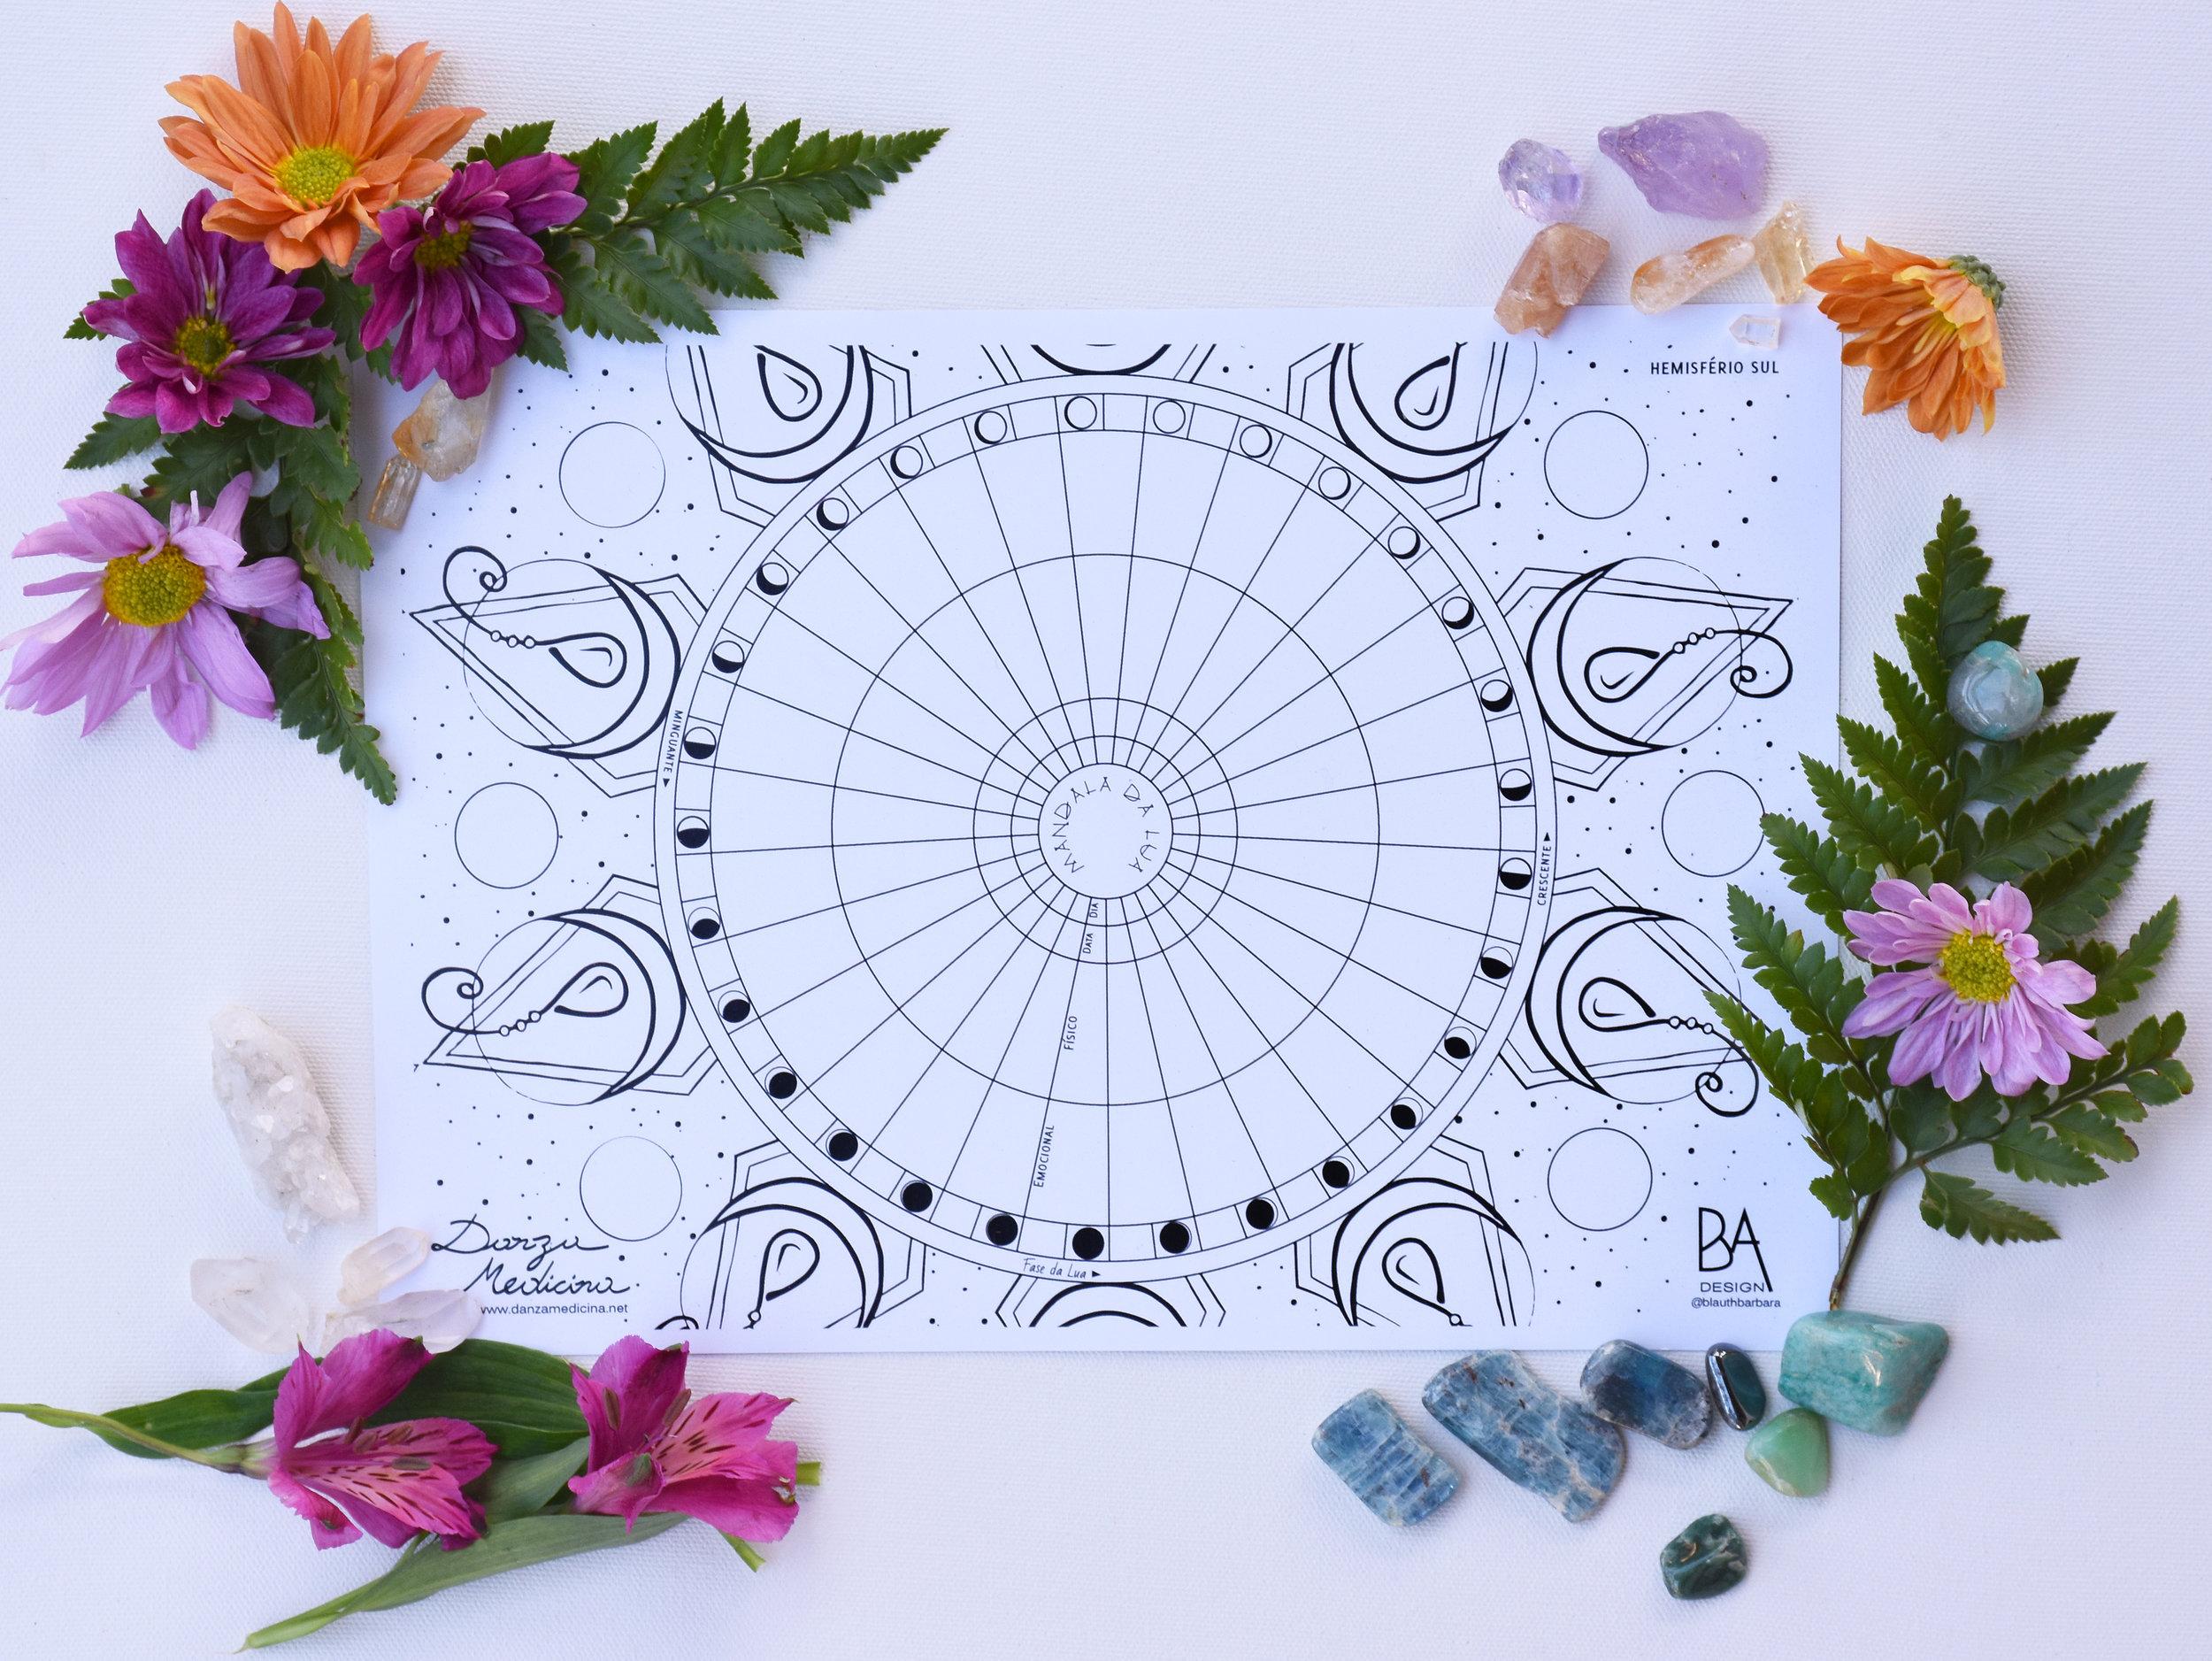 Mandala da Lua DanzaMedicina- por Barbara Blauth.